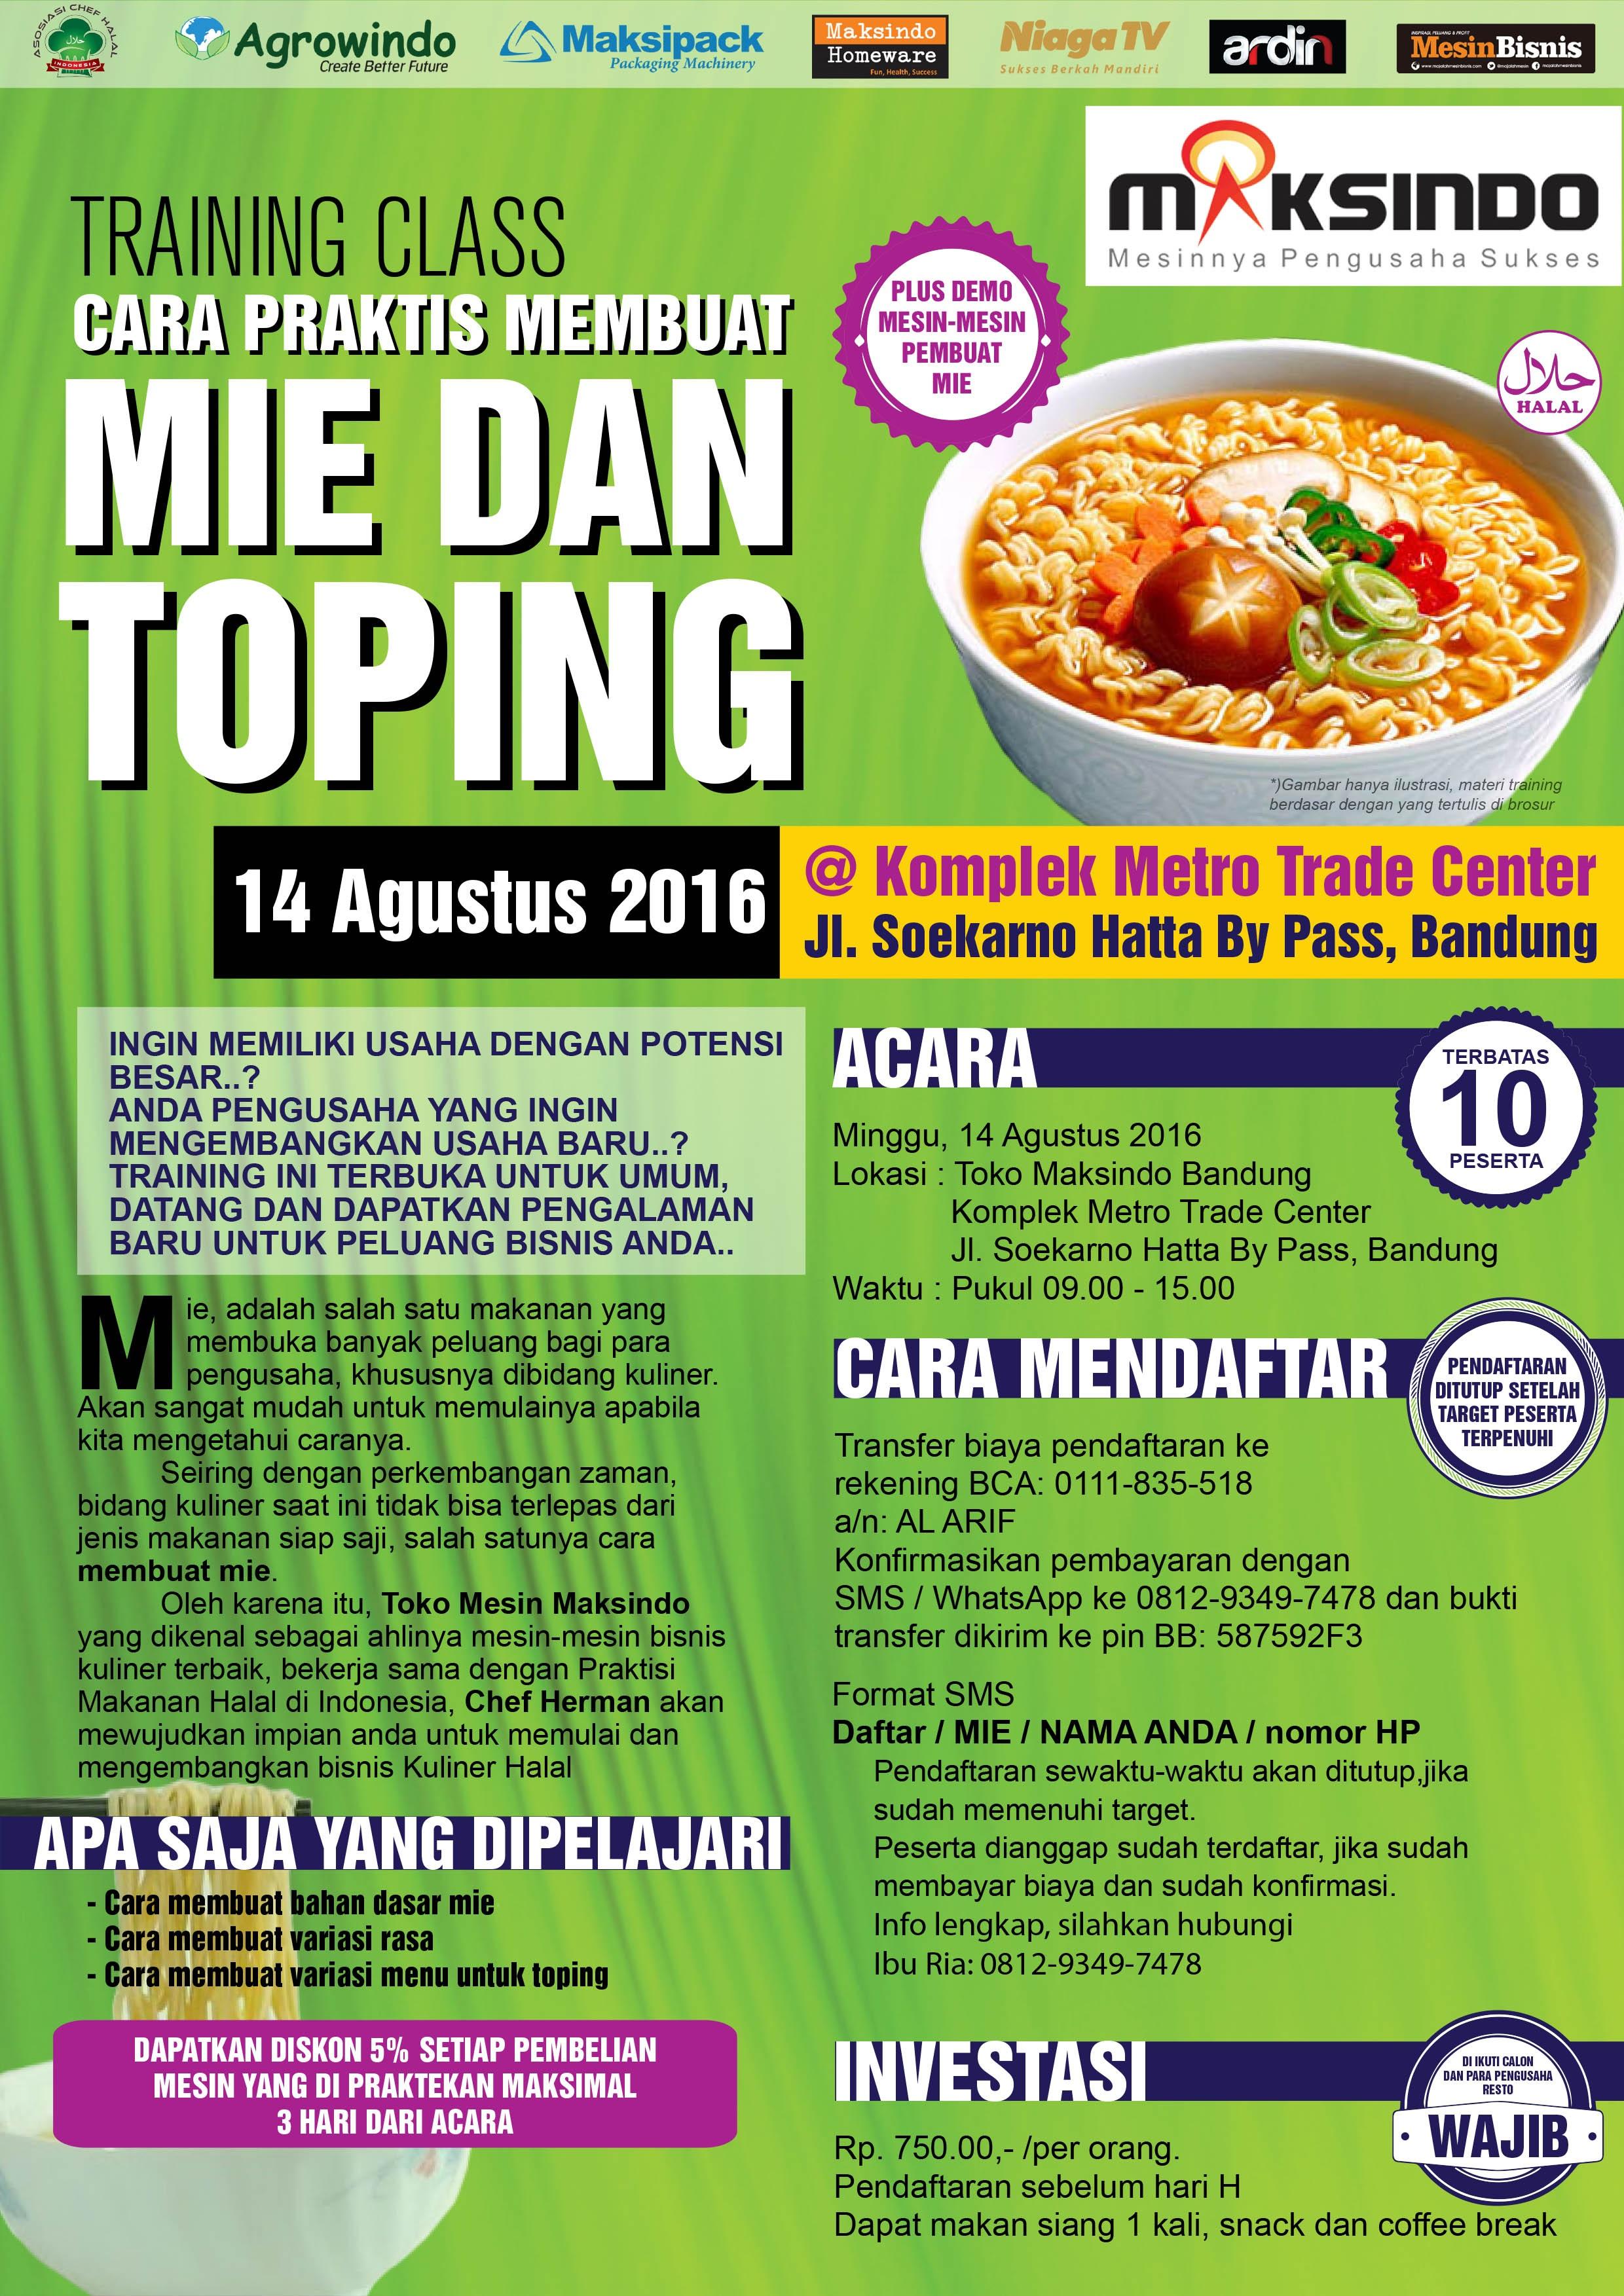 Training Usaha Mie dan Toping di Bandung, 14 Agustus 2016